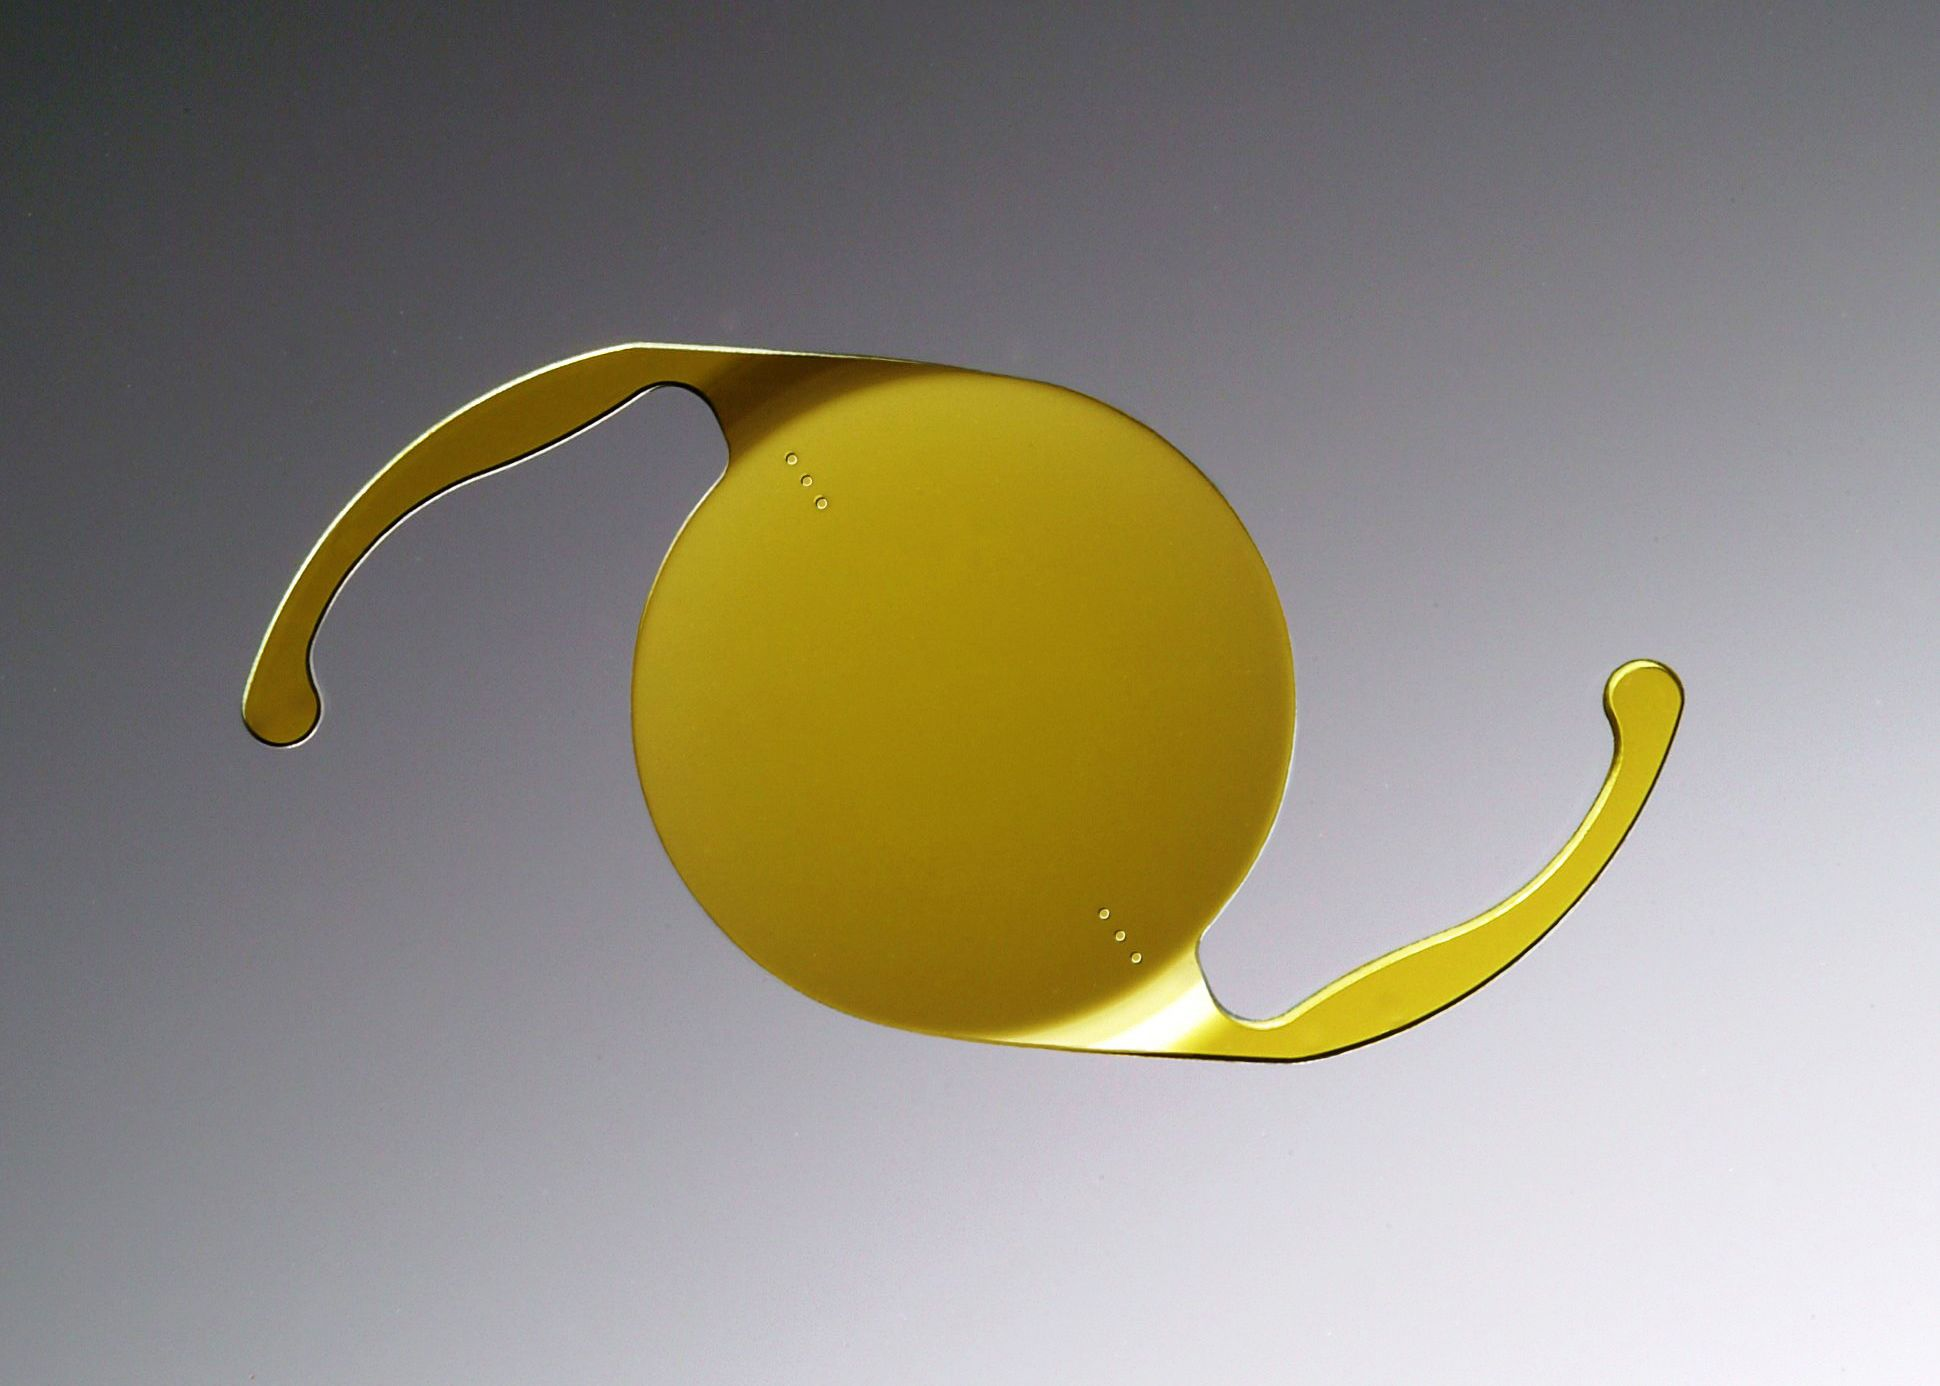 An intraocular lens (IOL)